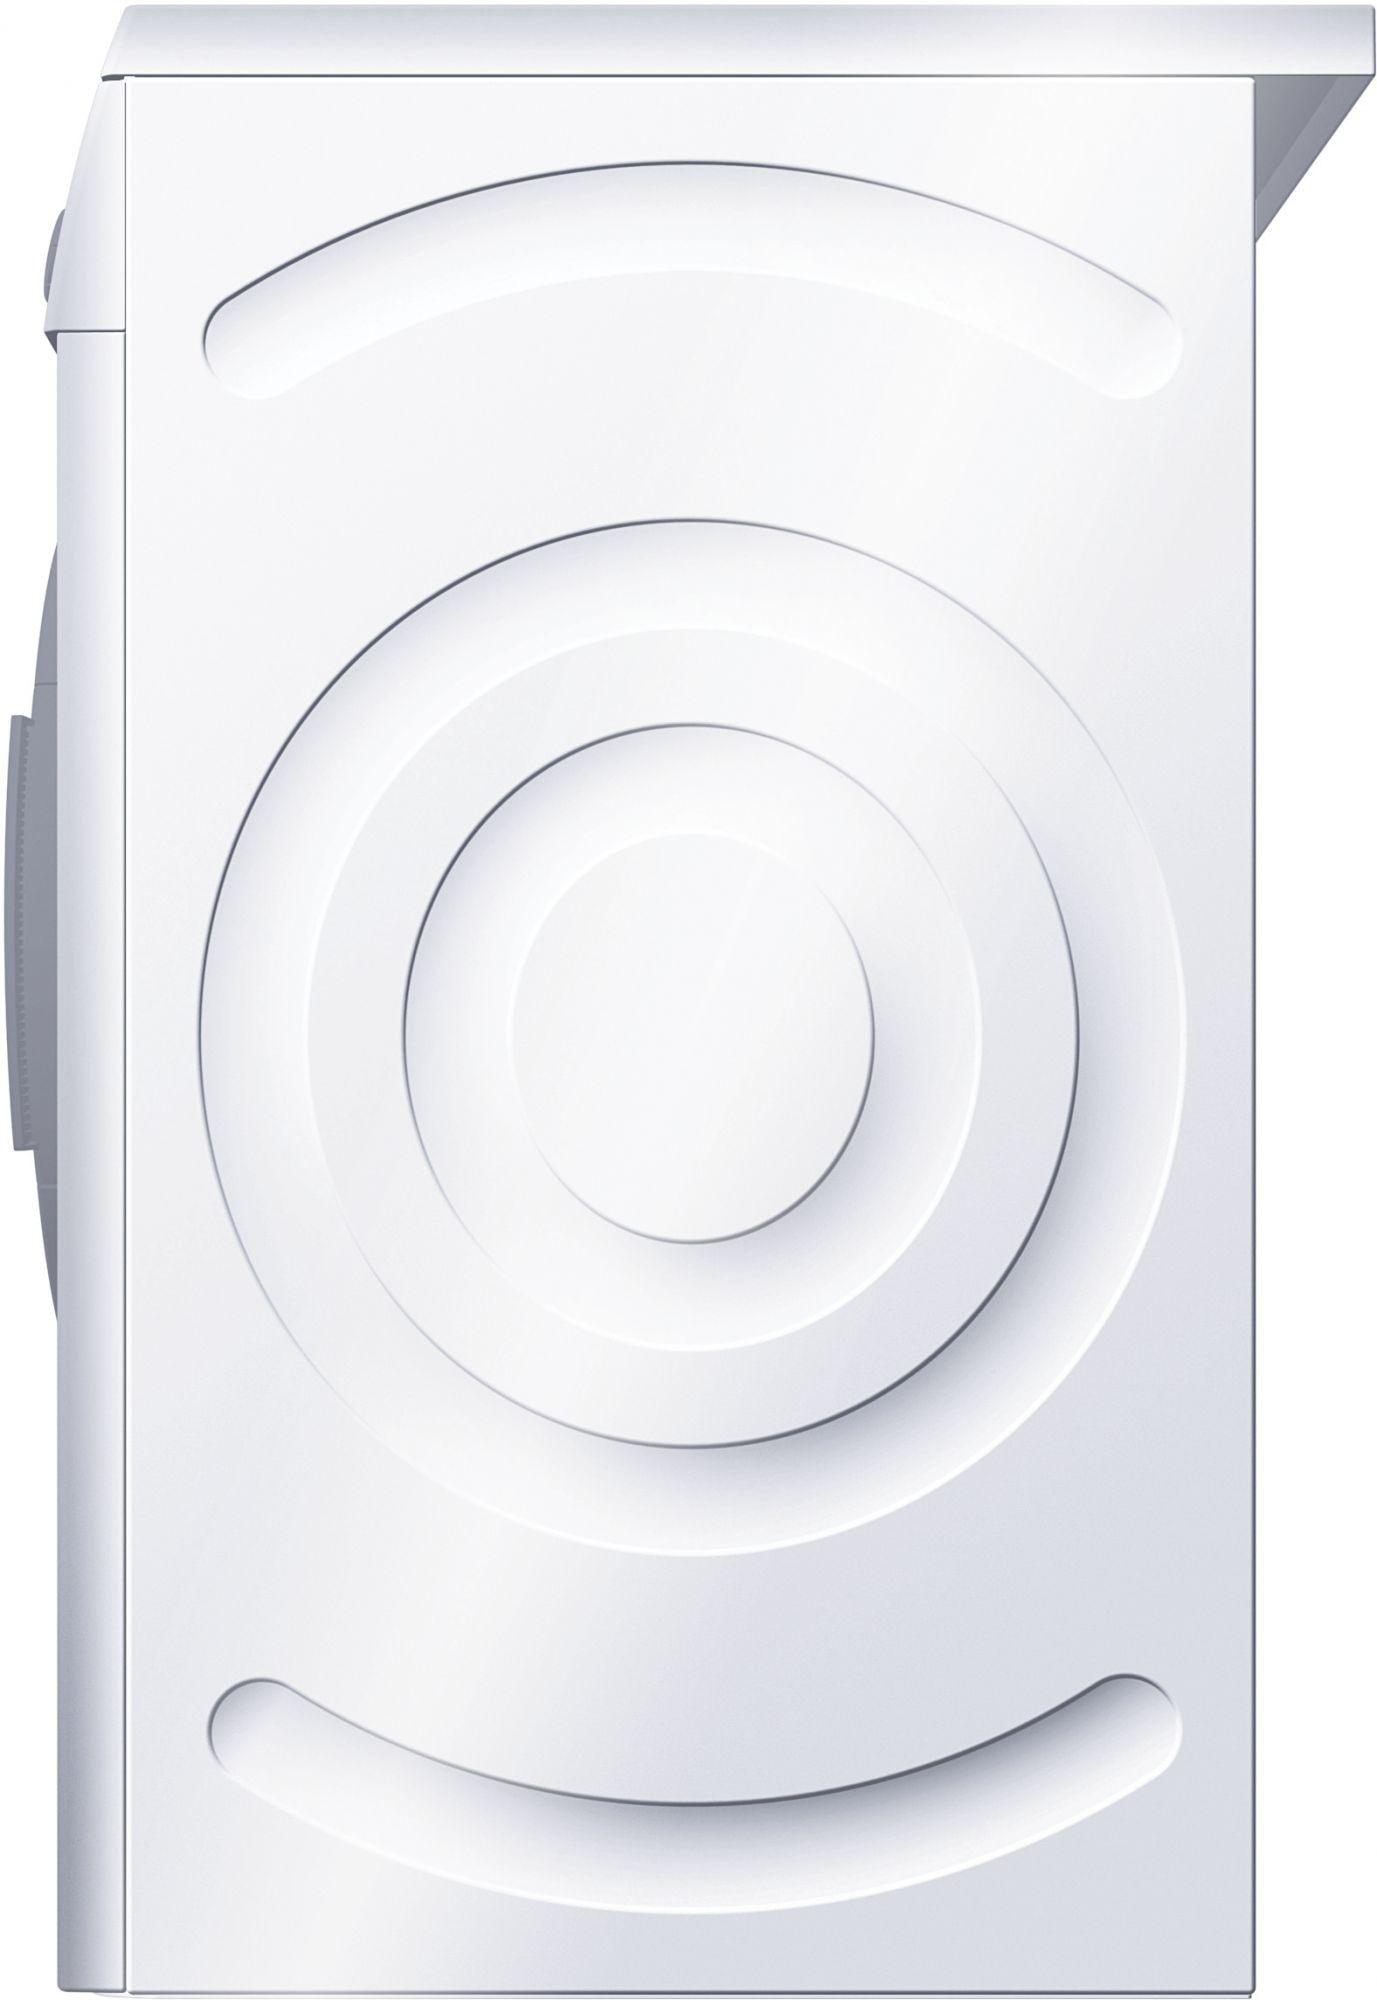 teamsix waq28442 weiss bosch elektro gro stand waschmaschinen. Black Bedroom Furniture Sets. Home Design Ideas